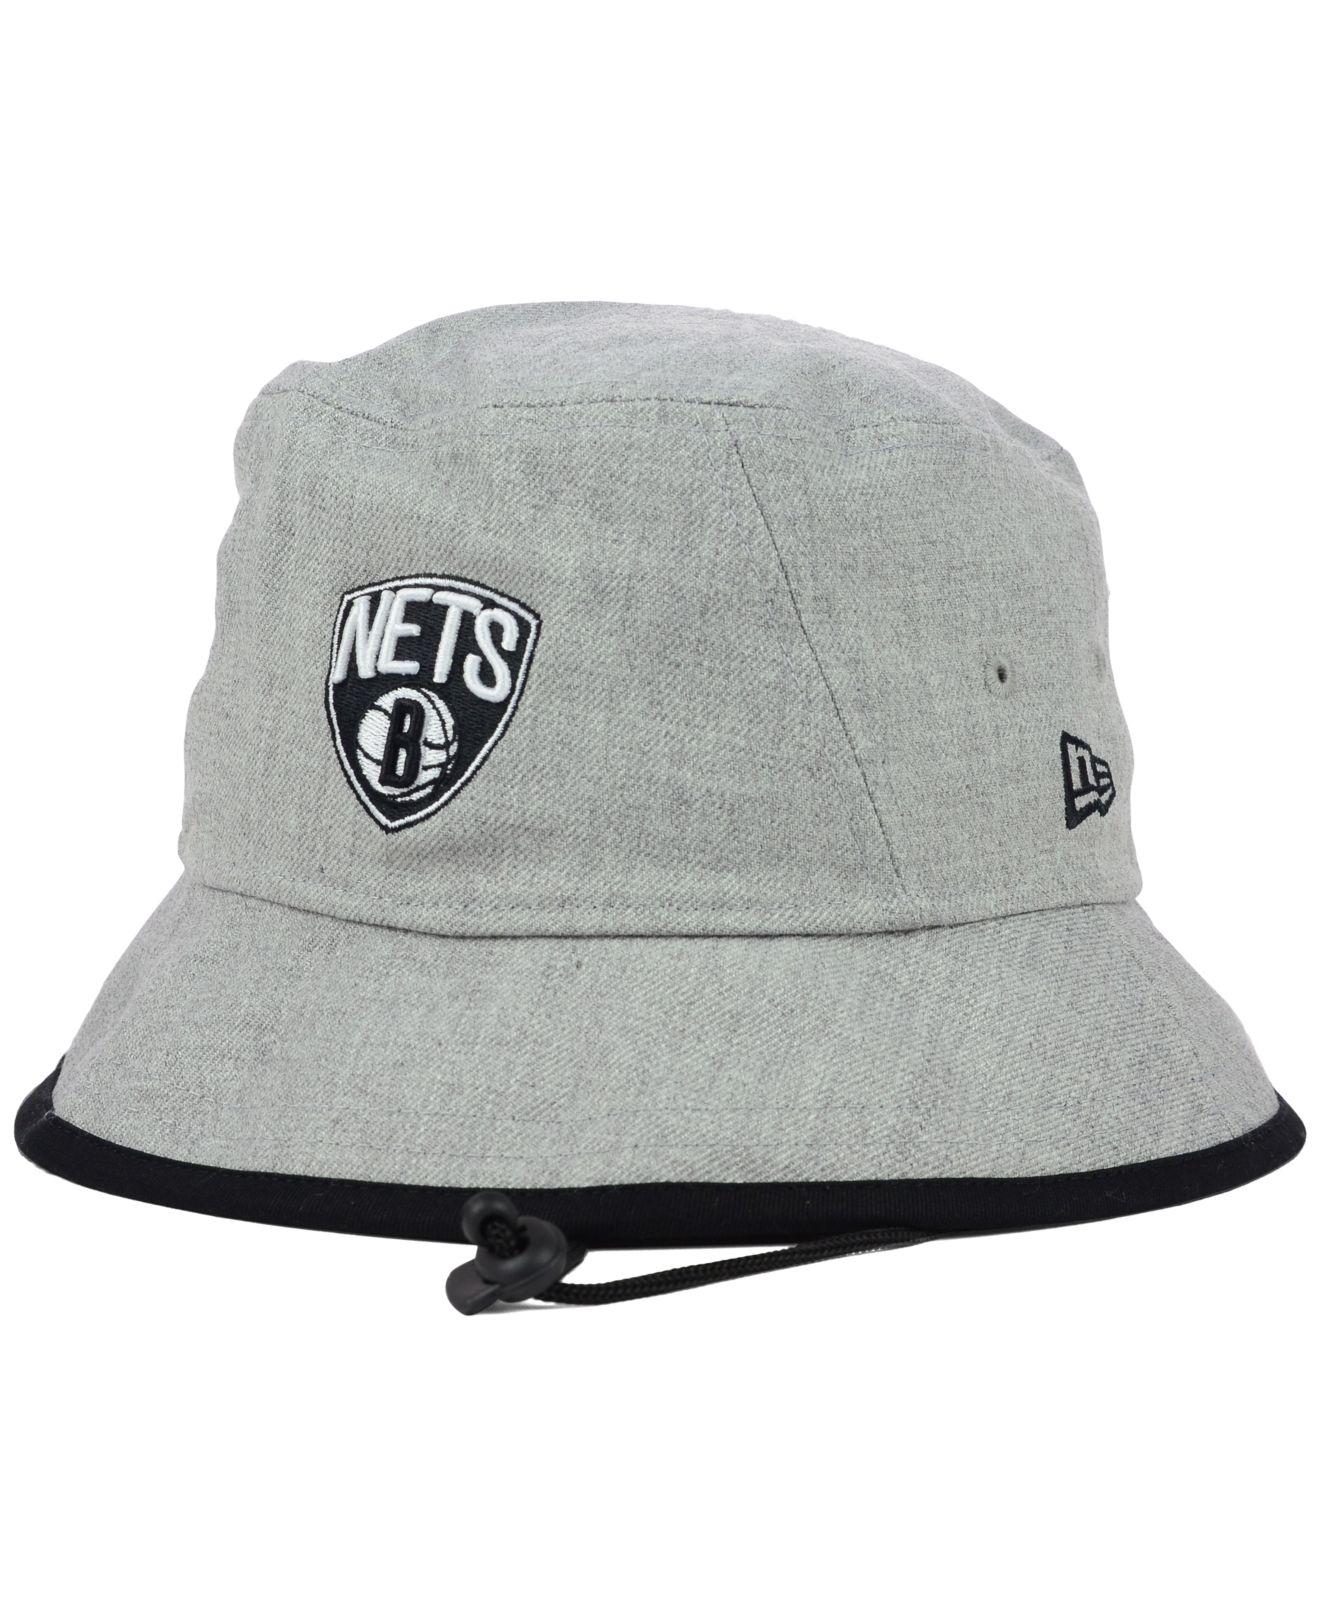 170e1c0df4c Lyst - KTZ Brooklyn Nets Hardwood Classics Fashion Tipped Bucket Hat ...